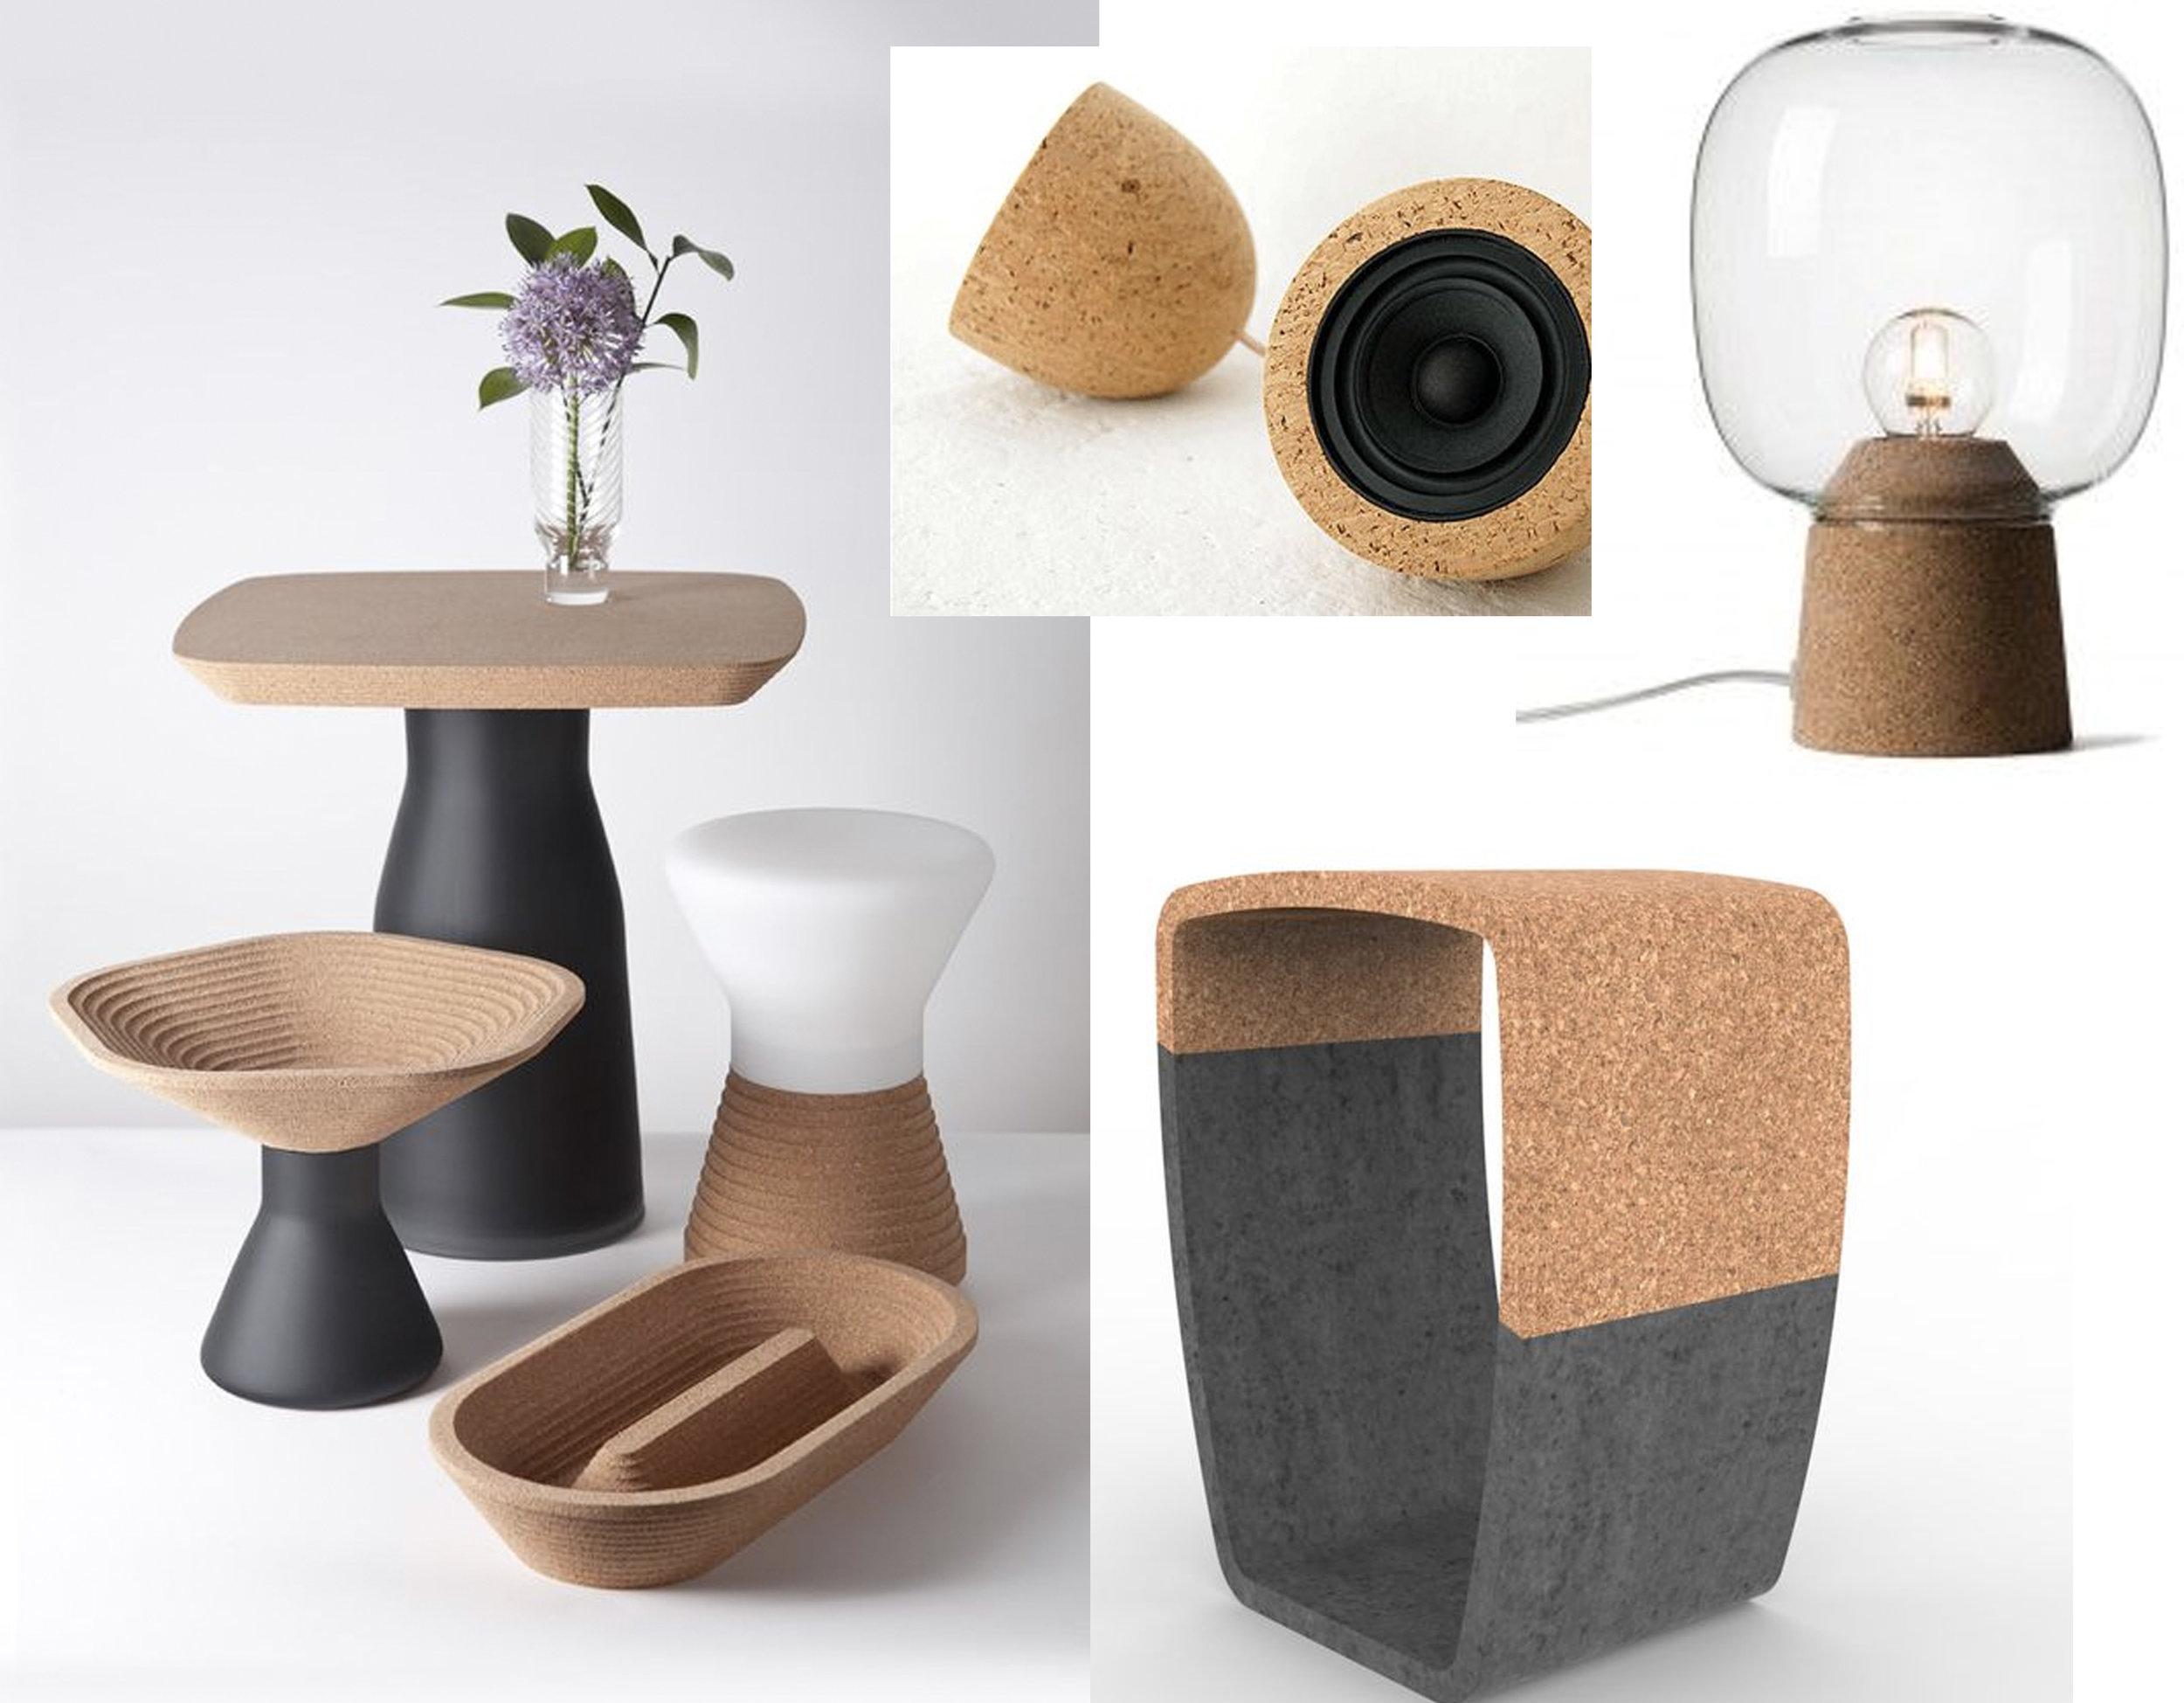 small tables via  Florian Lemariè  - USB speaker via  Design Flute  - table lamp Picia  Buru Buru  - Concrete and cork stool